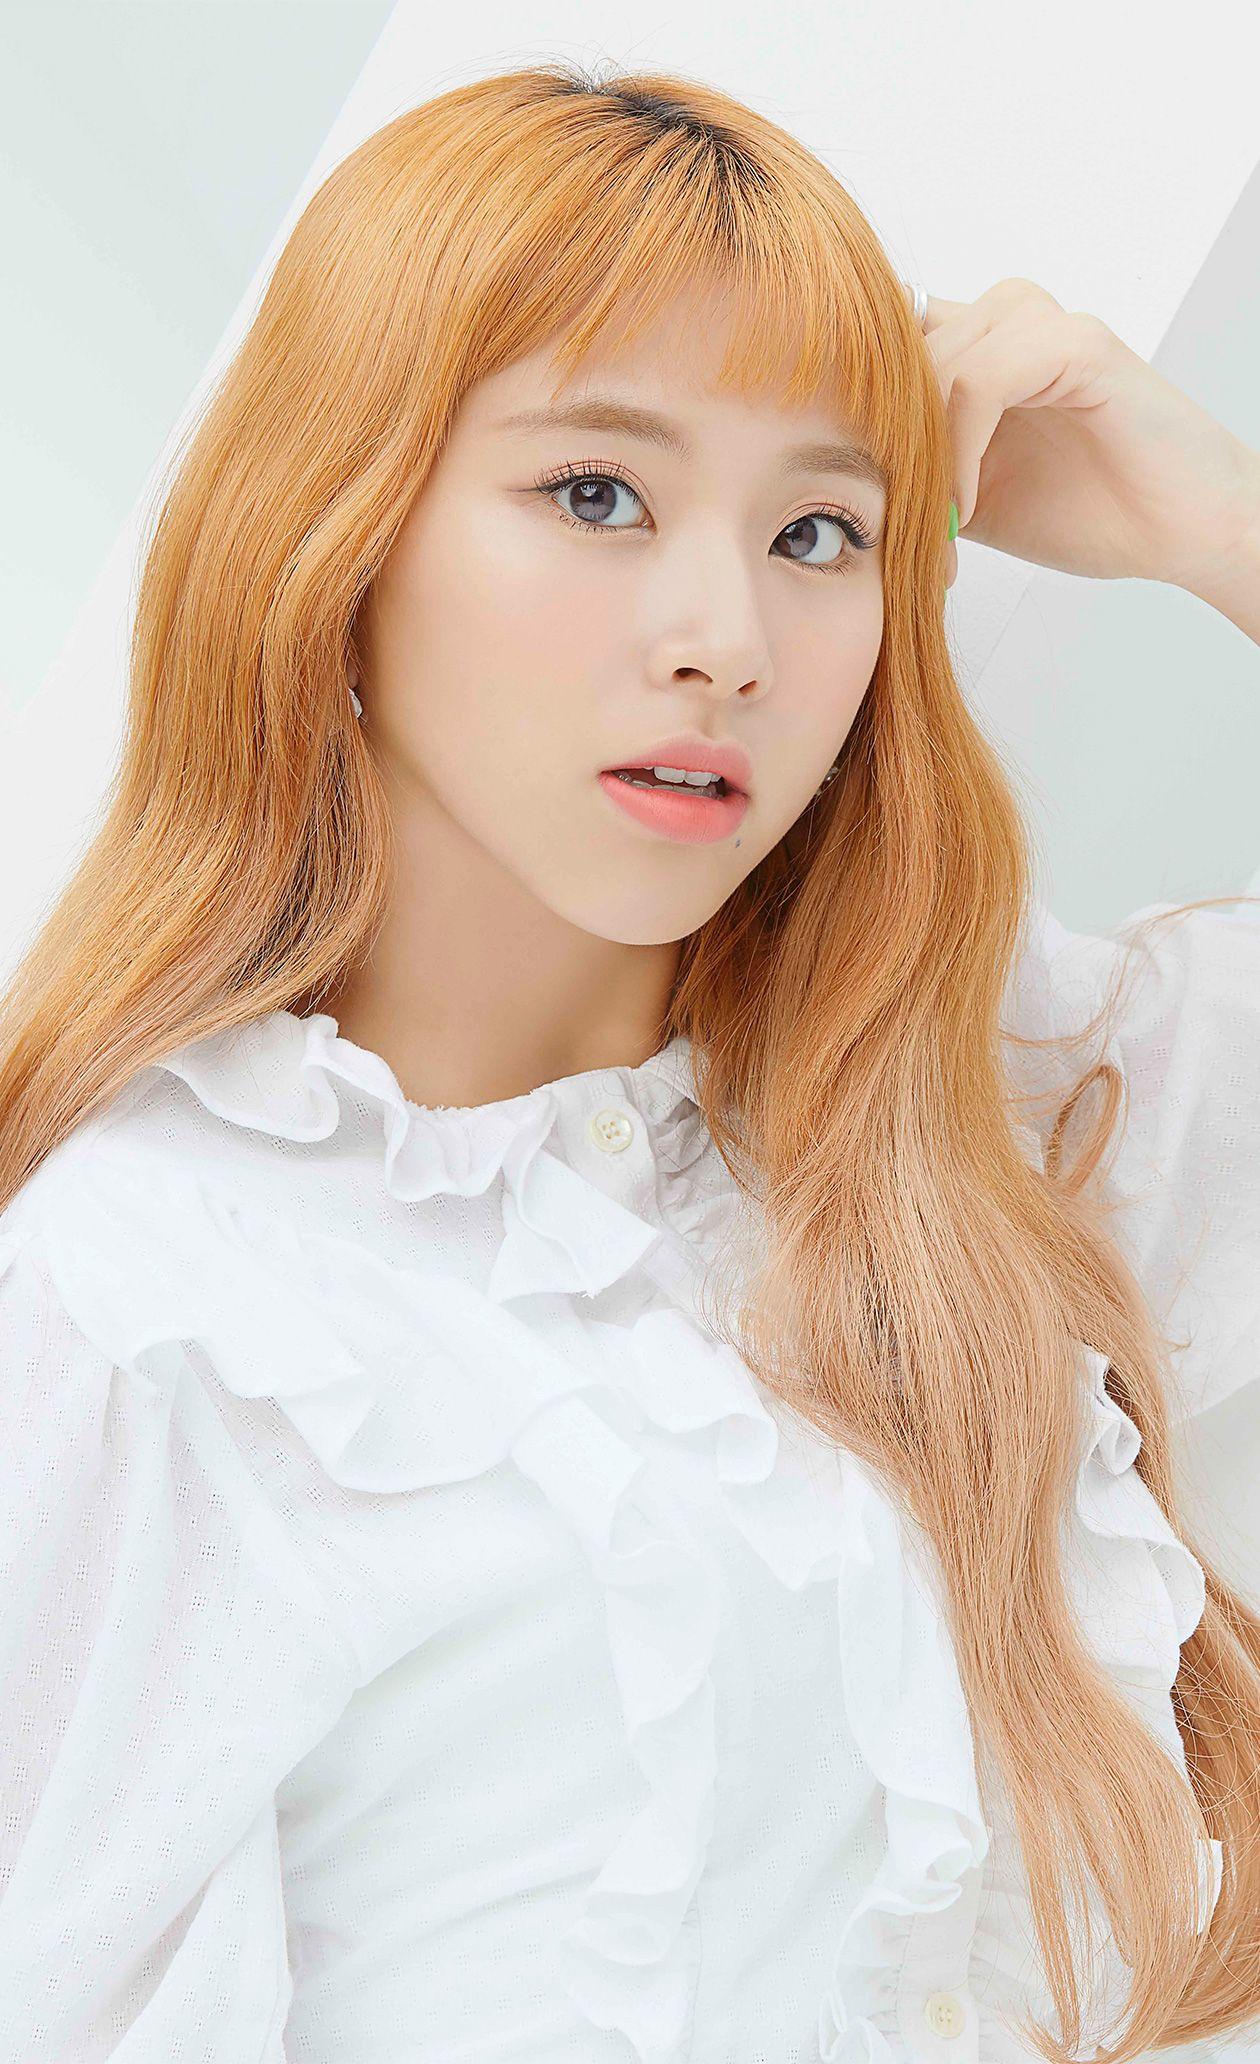 Pin by Sami B on Twice | Kpop girls, Twice, Park ji soo